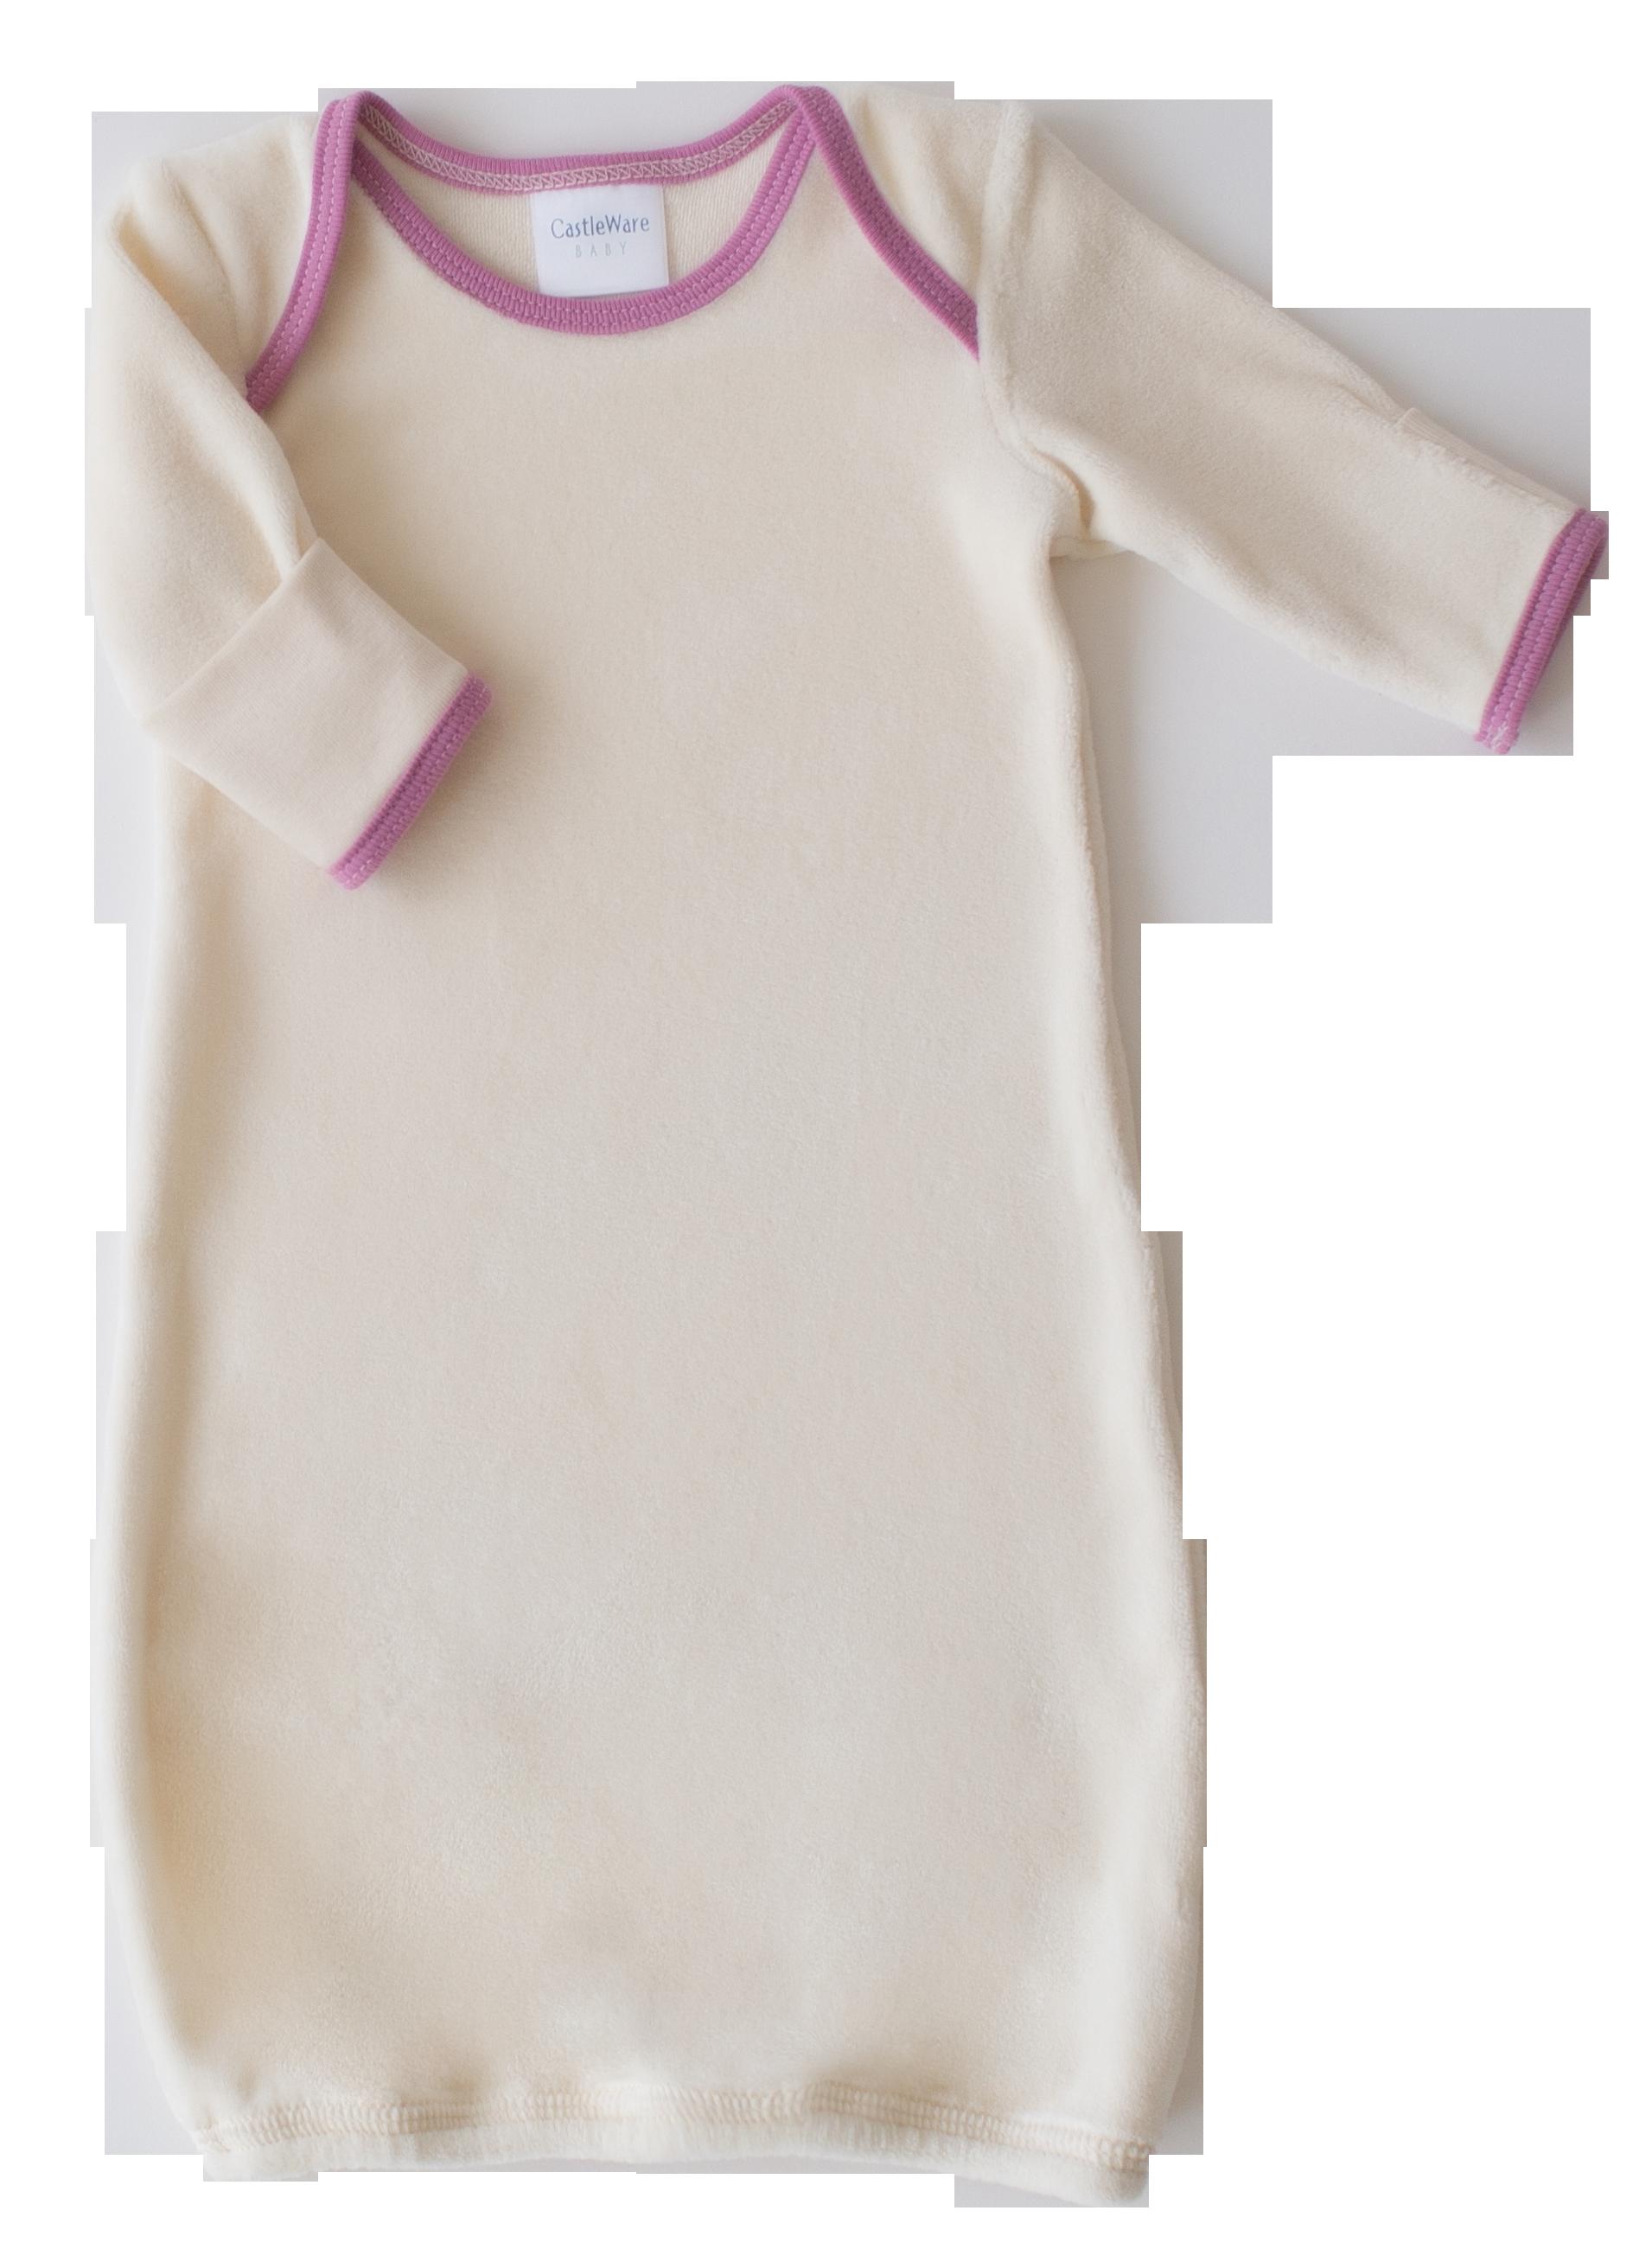 Velour gown castlewareus chemical free sleep ware pinterest